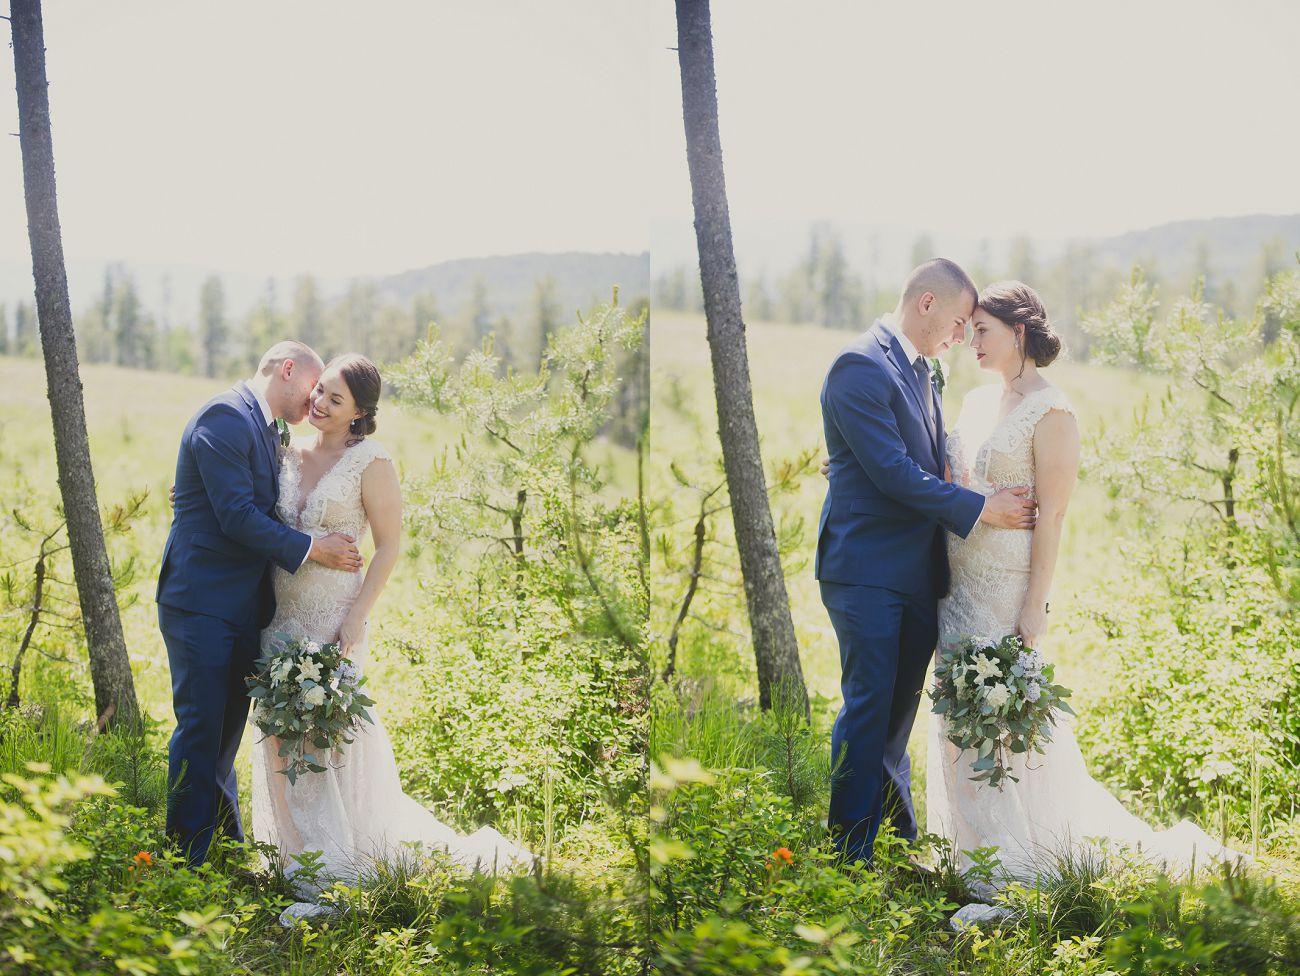 Jennifer_Mooney_Photo_Glacier_Park_Weddings_Elopement_00032.jpg